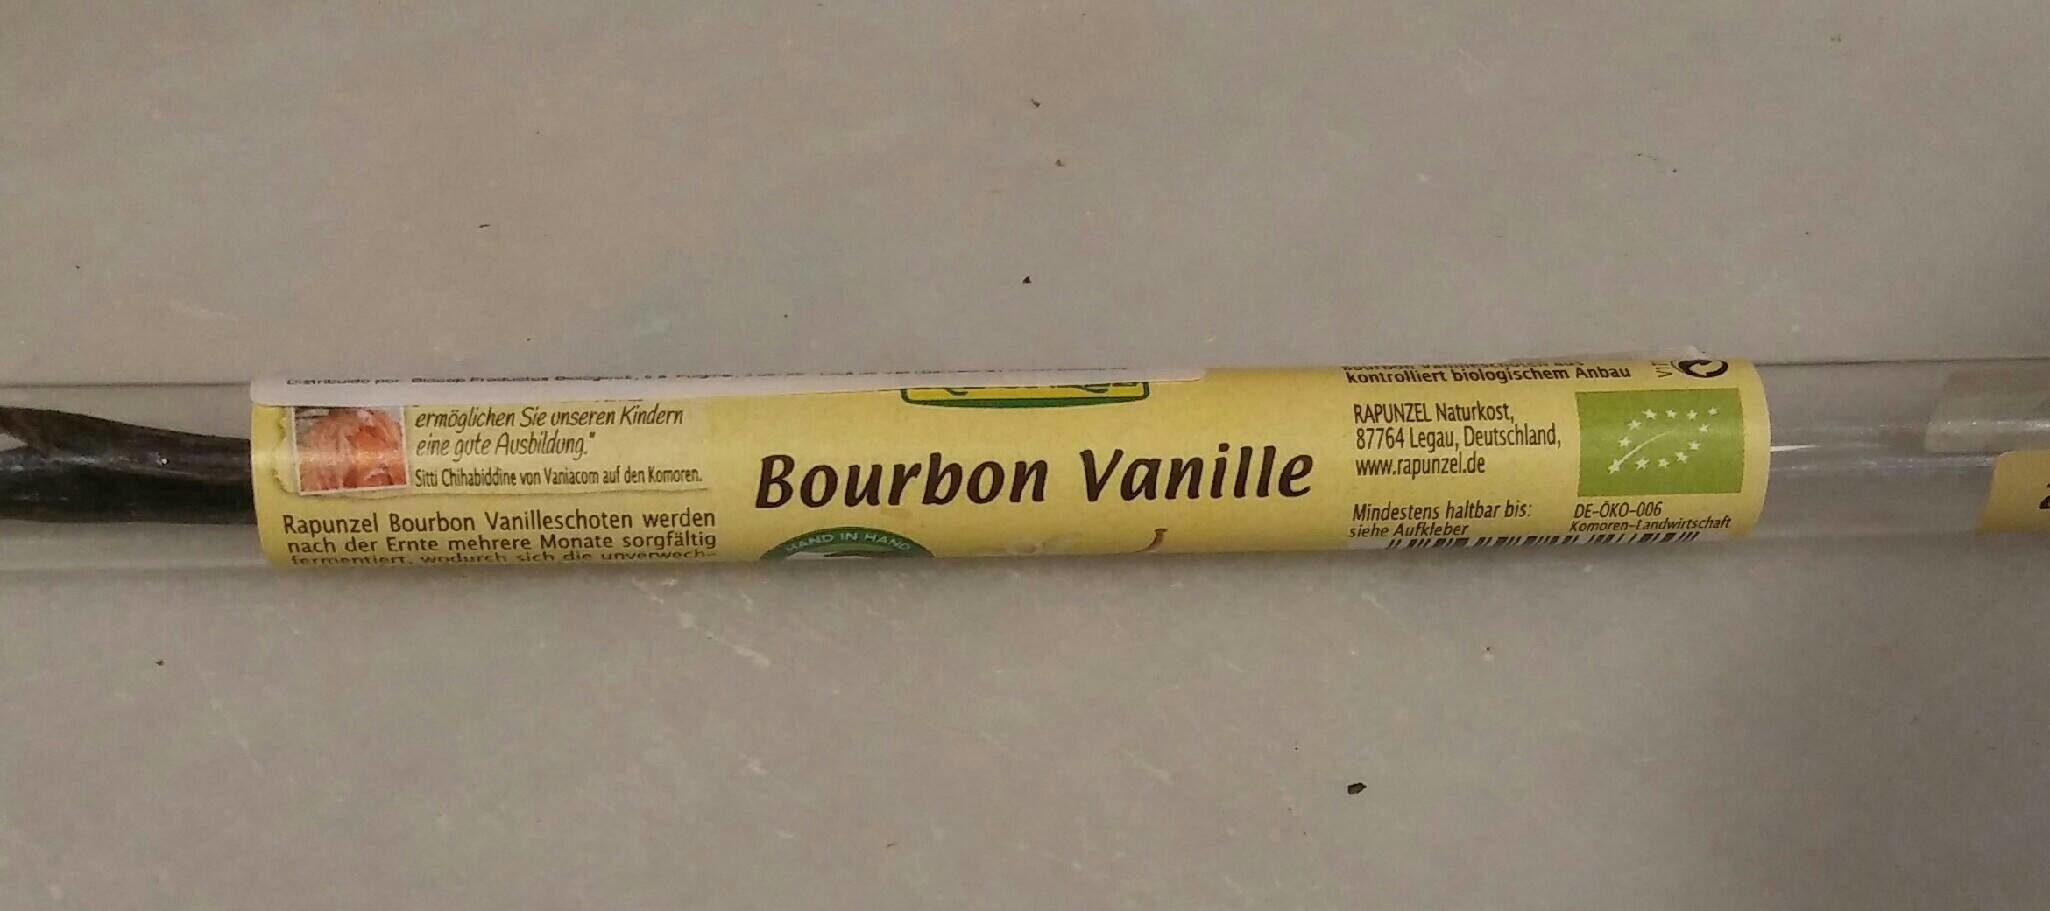 Vainilla de Bourbon en Rama - Product